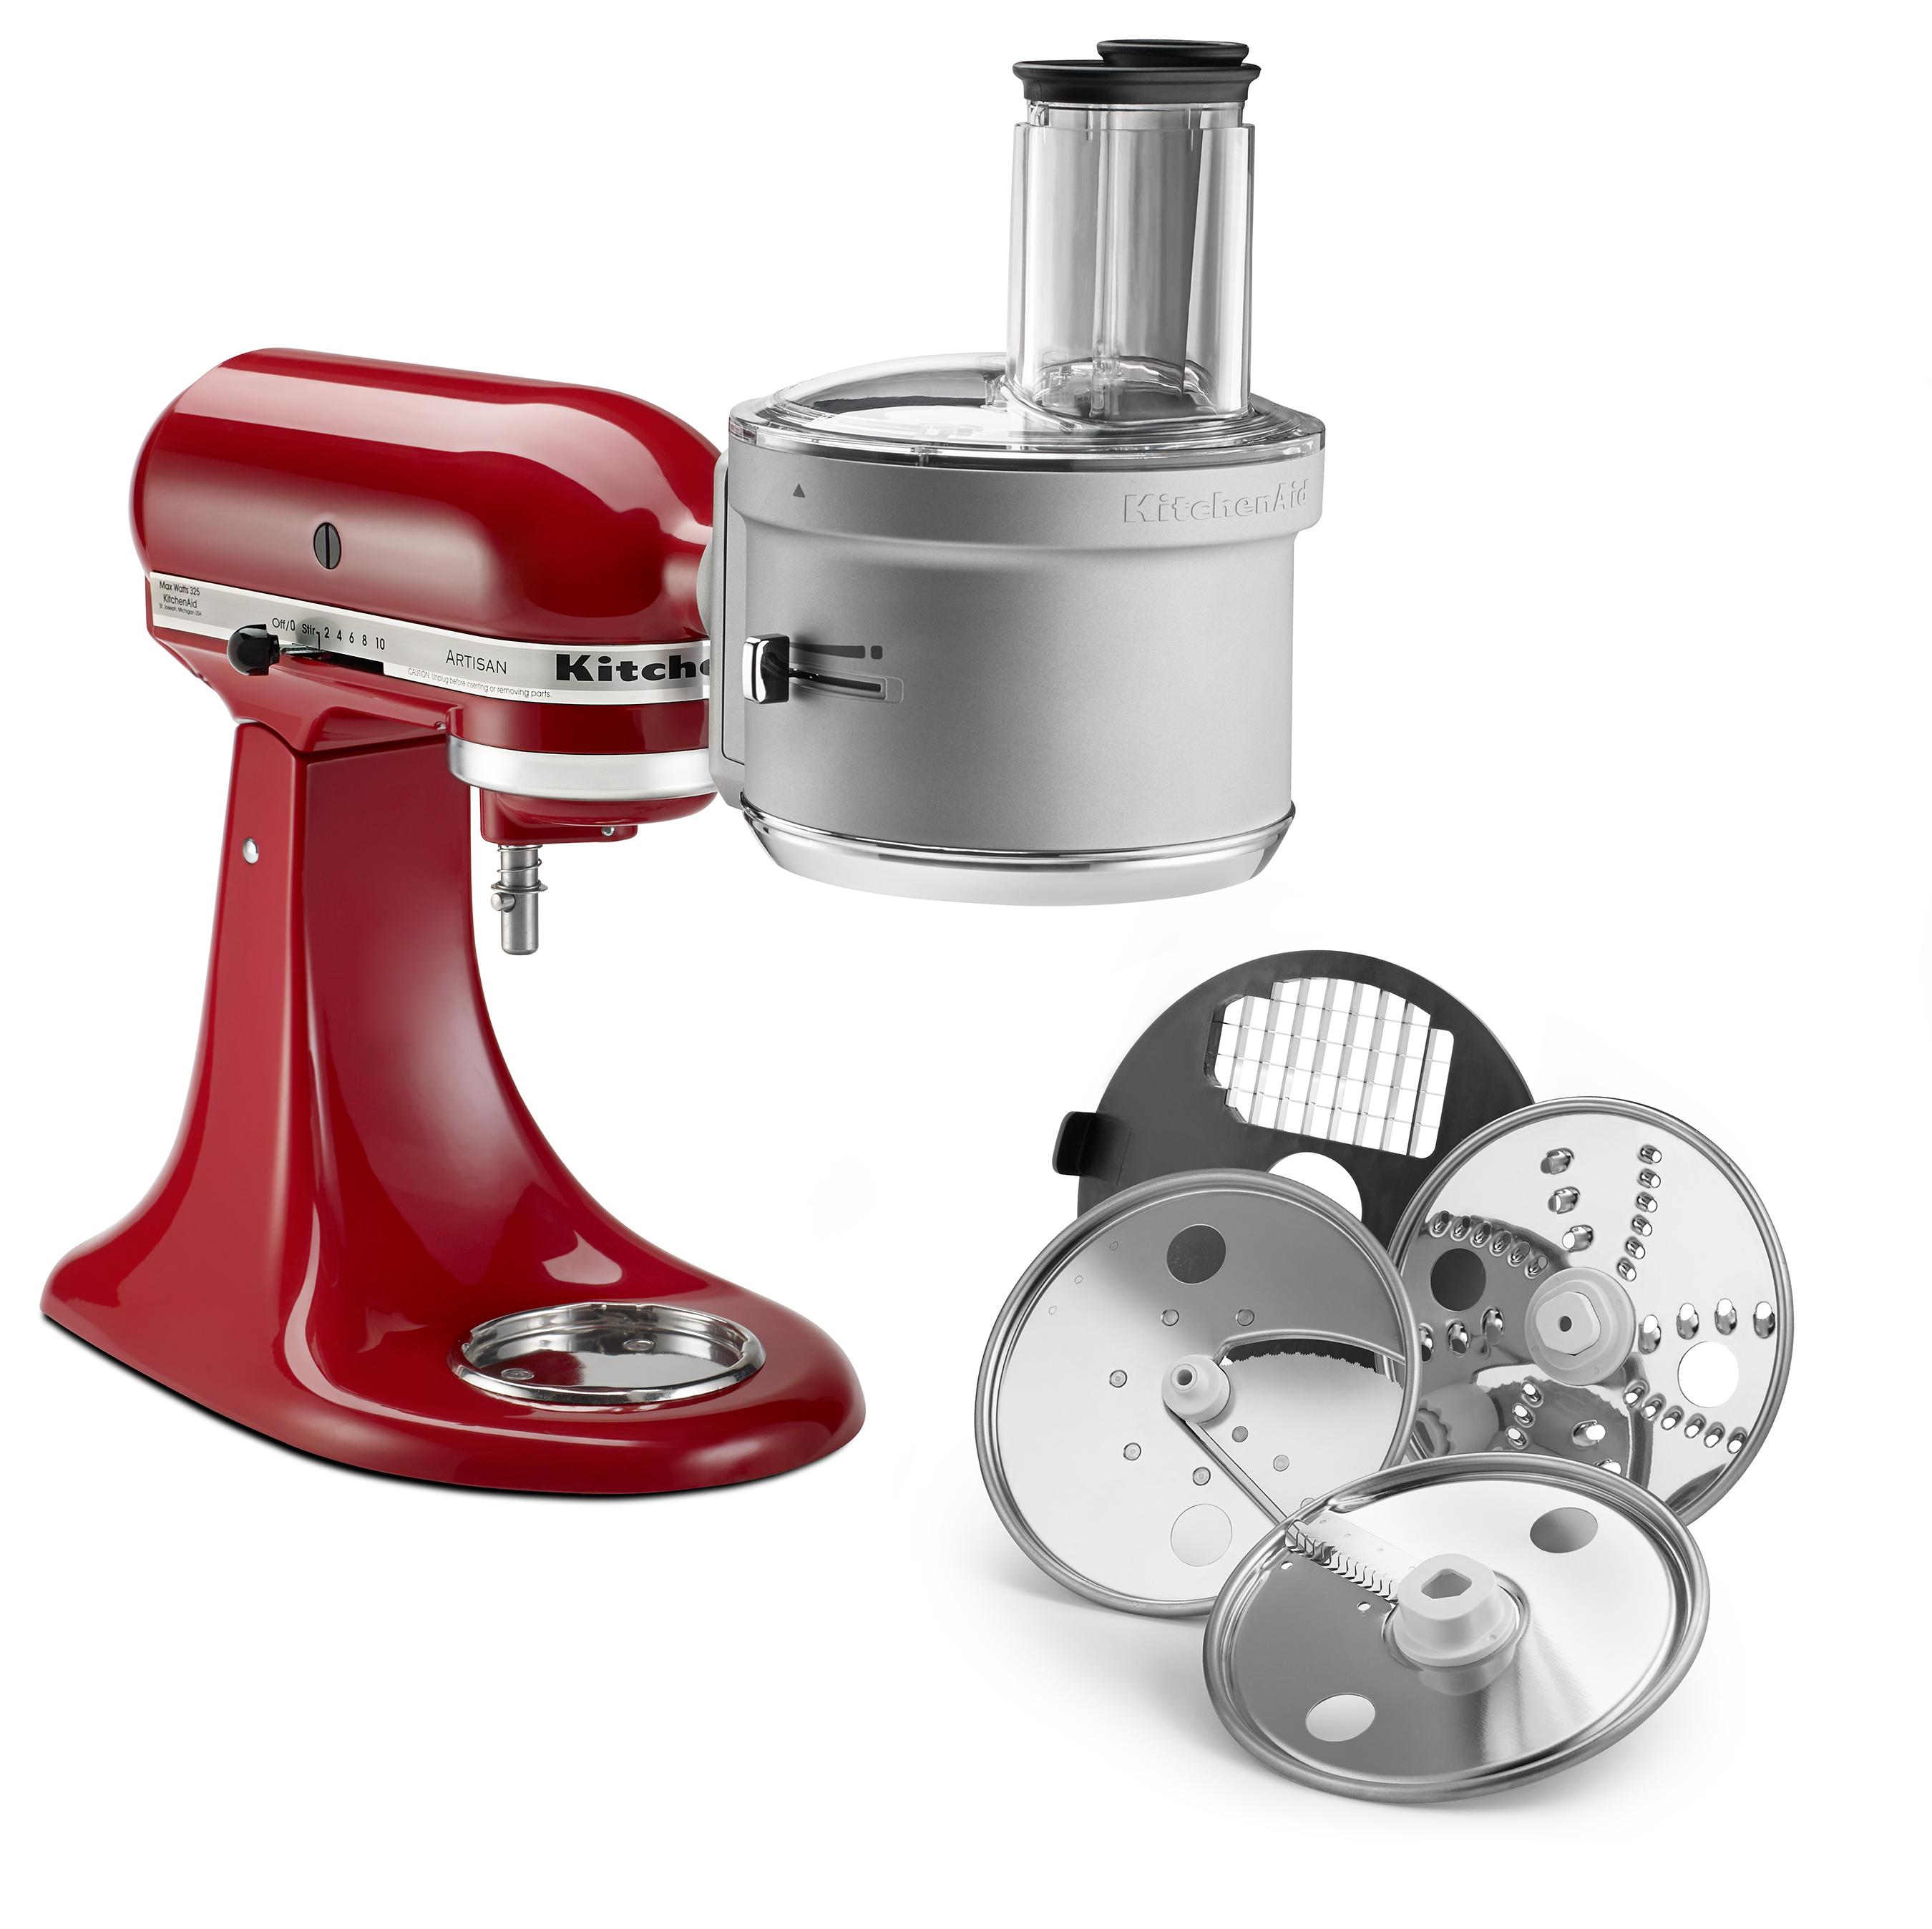 Kitchenaid Fppa Mixer Attachment Pack For Stand Mixers #24: Further Kitchenaid Mixer Parts Furthermore Kitchenaid Stand Mixer